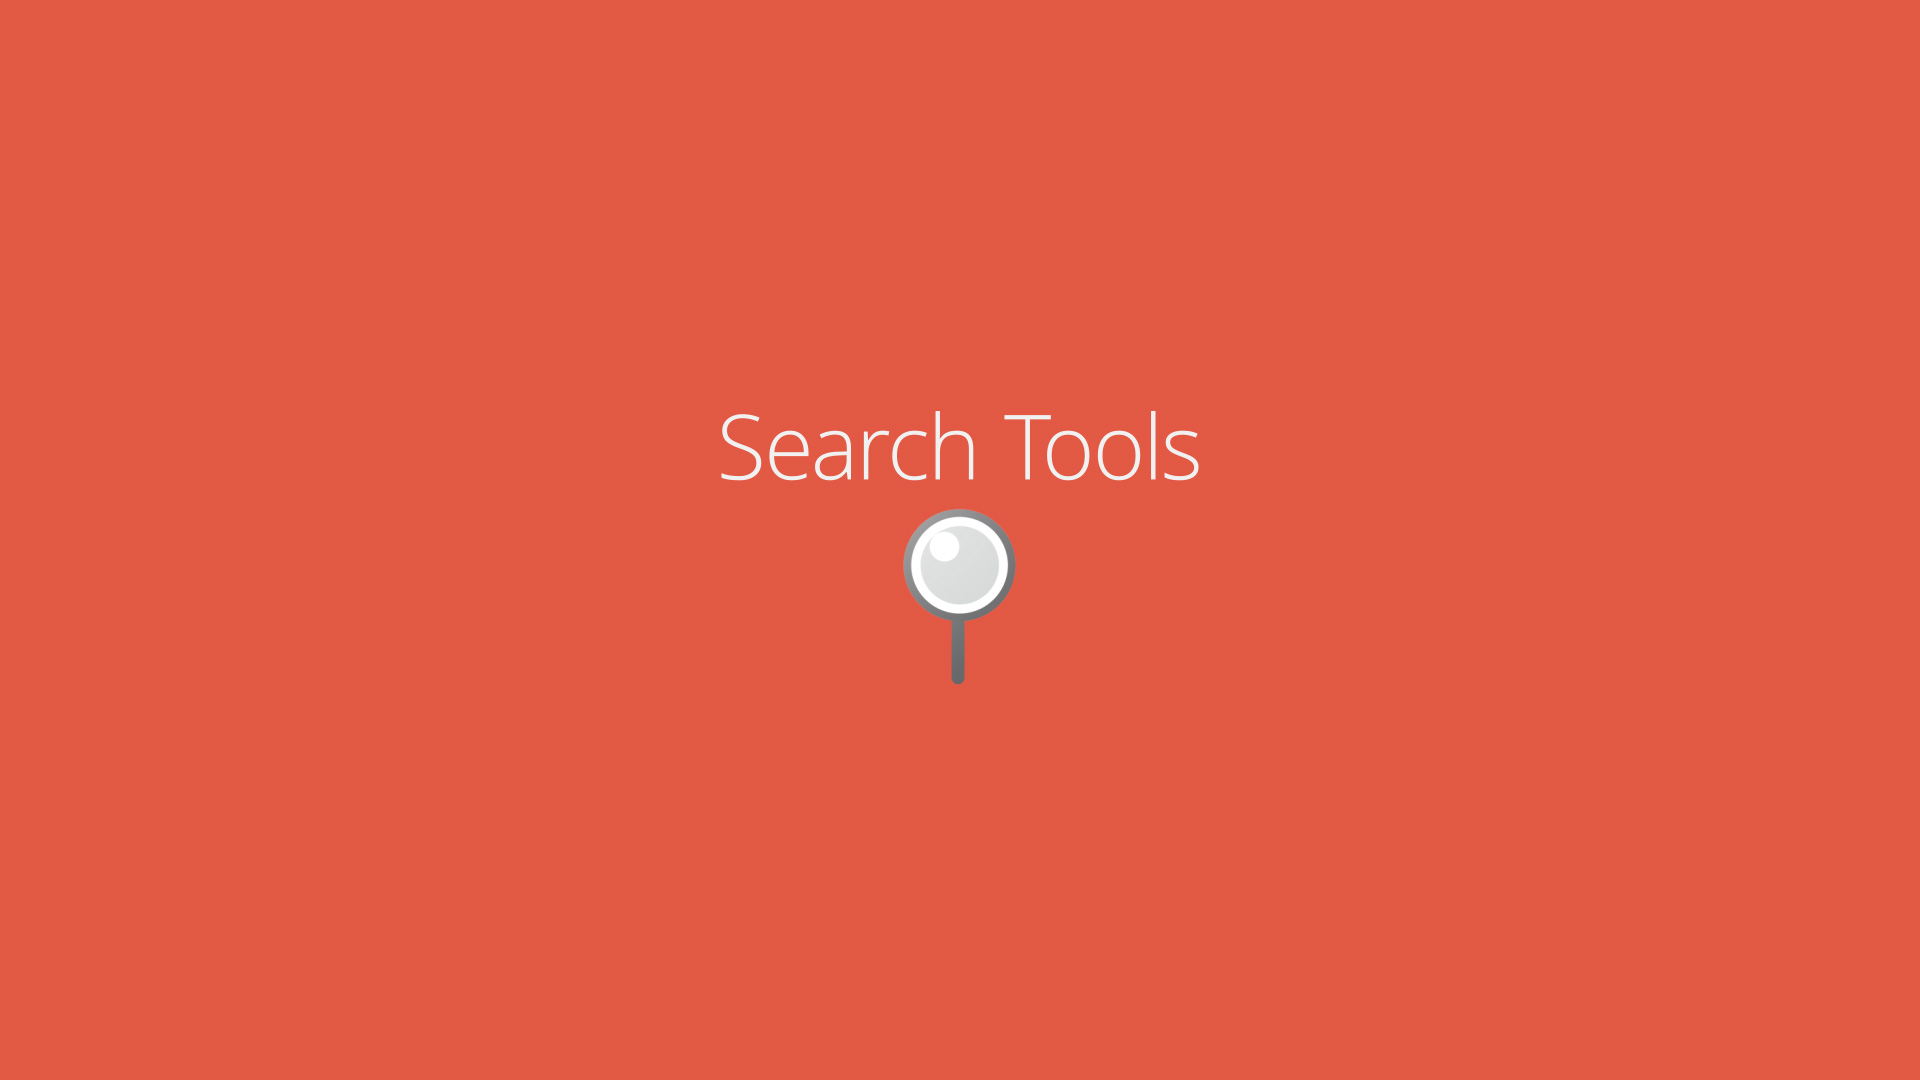 SearchTools.jpg